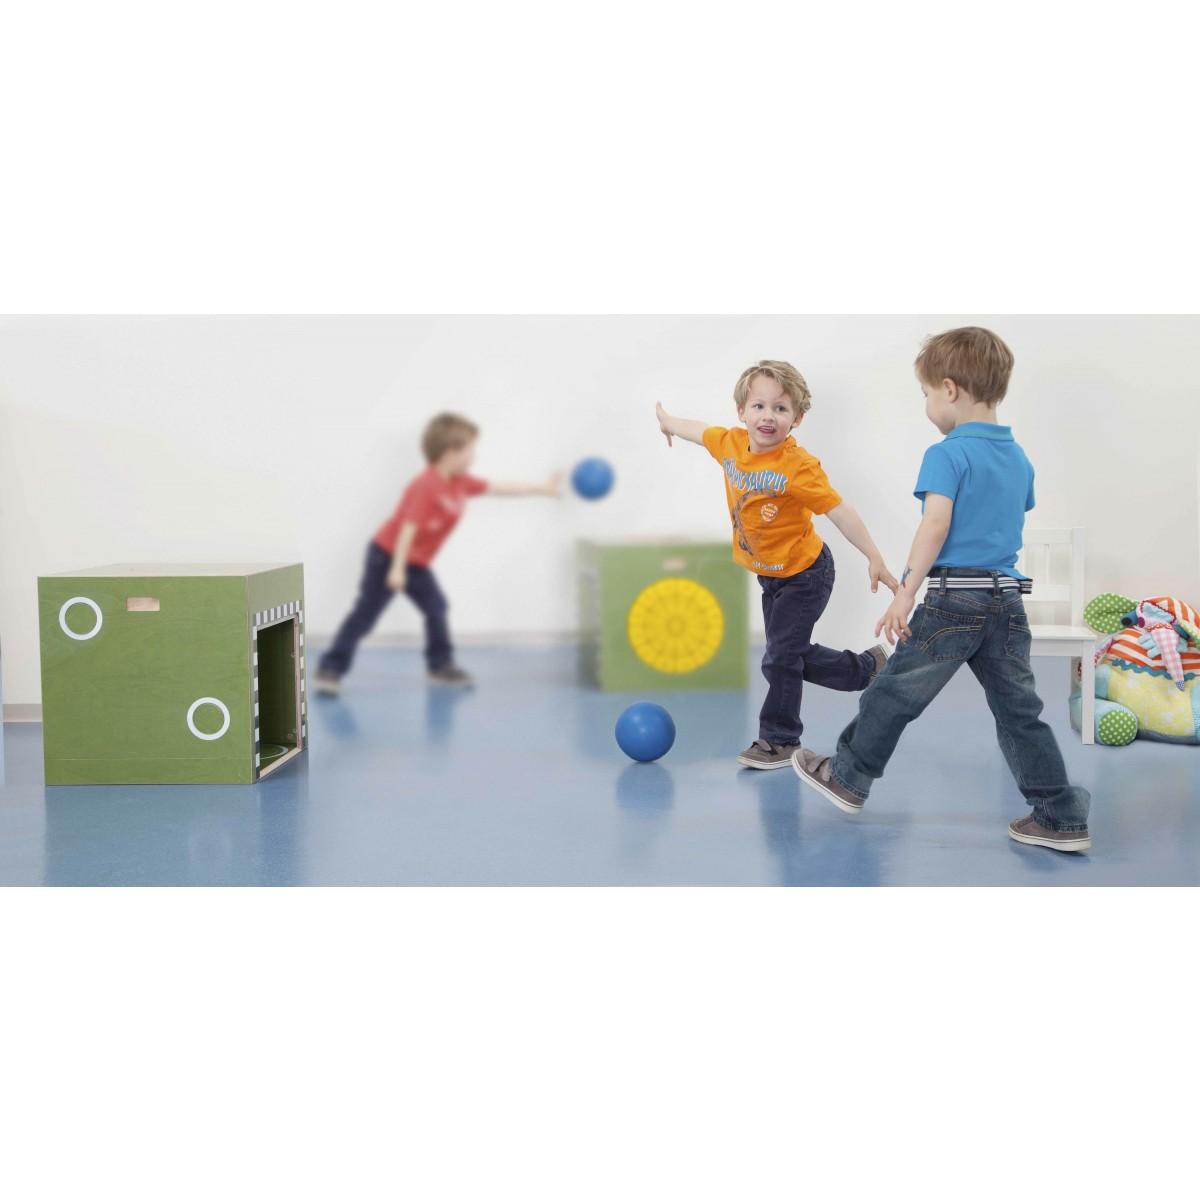 talentkiste - Sport- & Spielmöbel